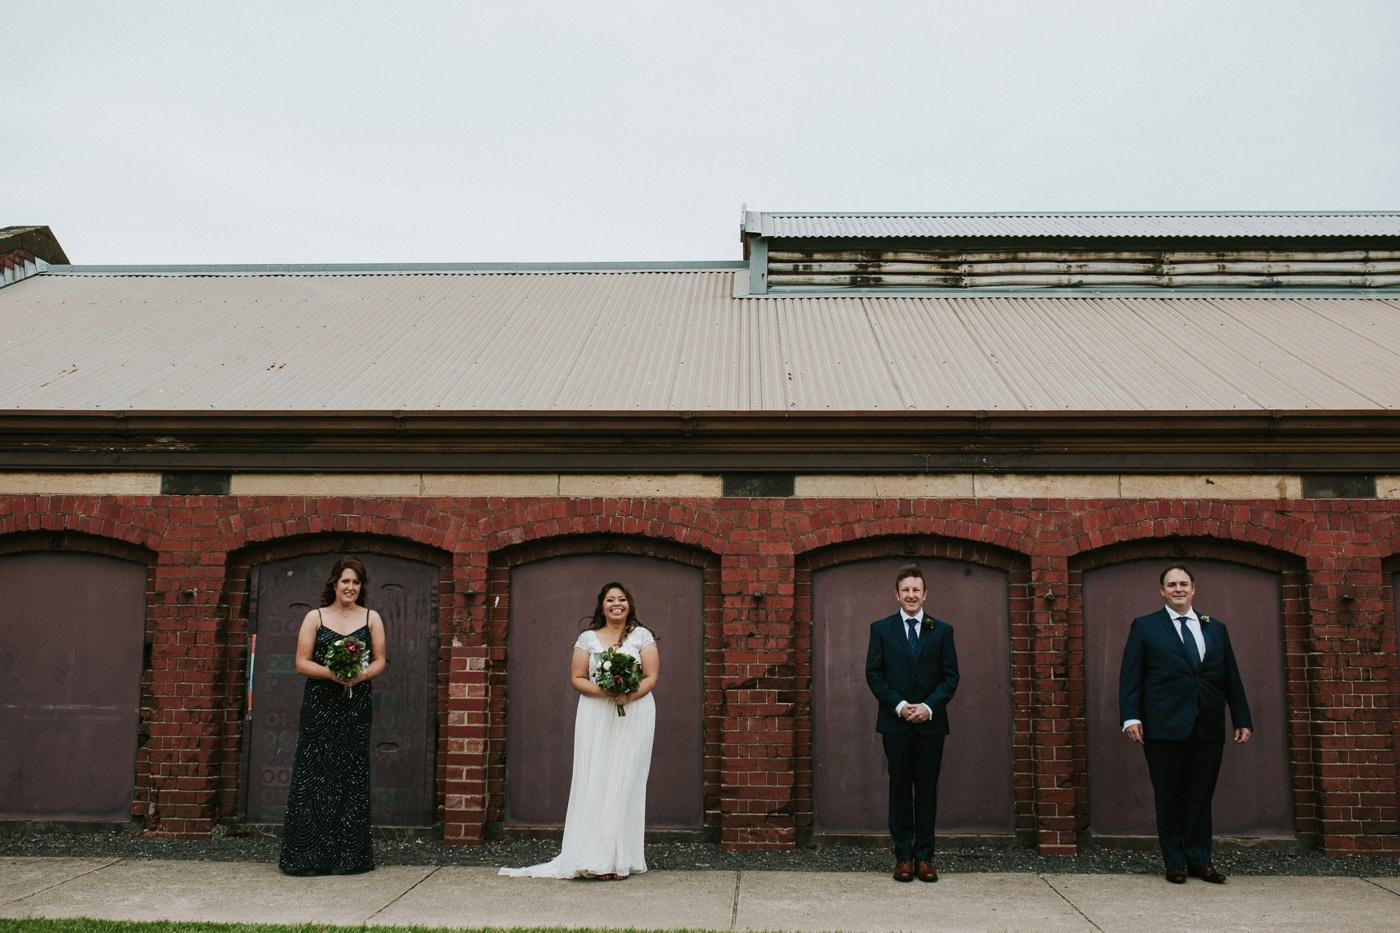 anitadaniel_melbourne-scienceworks-relaxed-fun-geek-wedding_melbourne-candid-wedding-photography_14